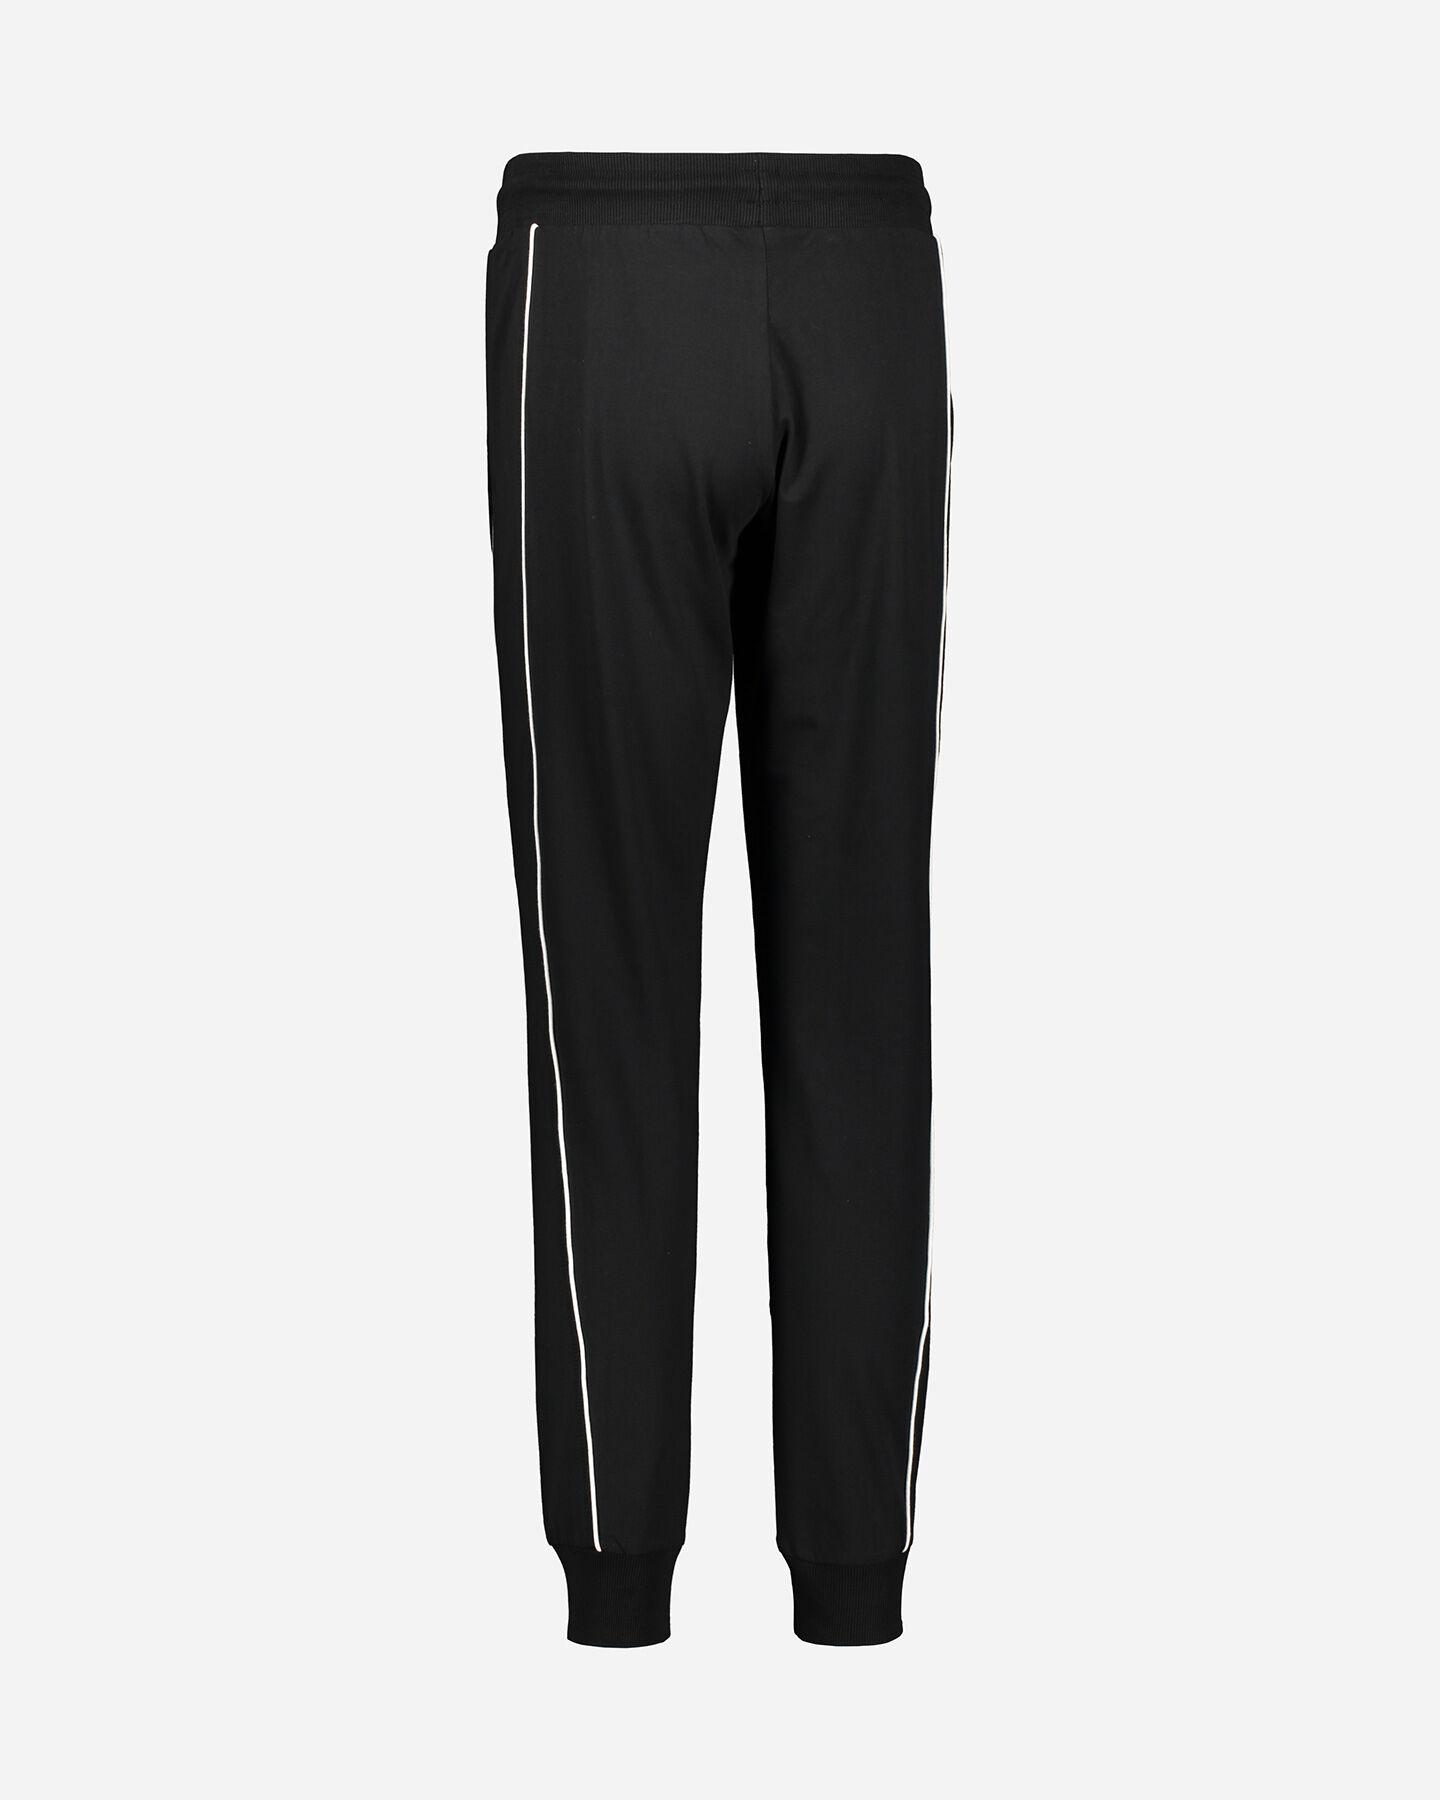 Pantalone ARENA JSTRETCH SKINNY W S4081058 scatto 2